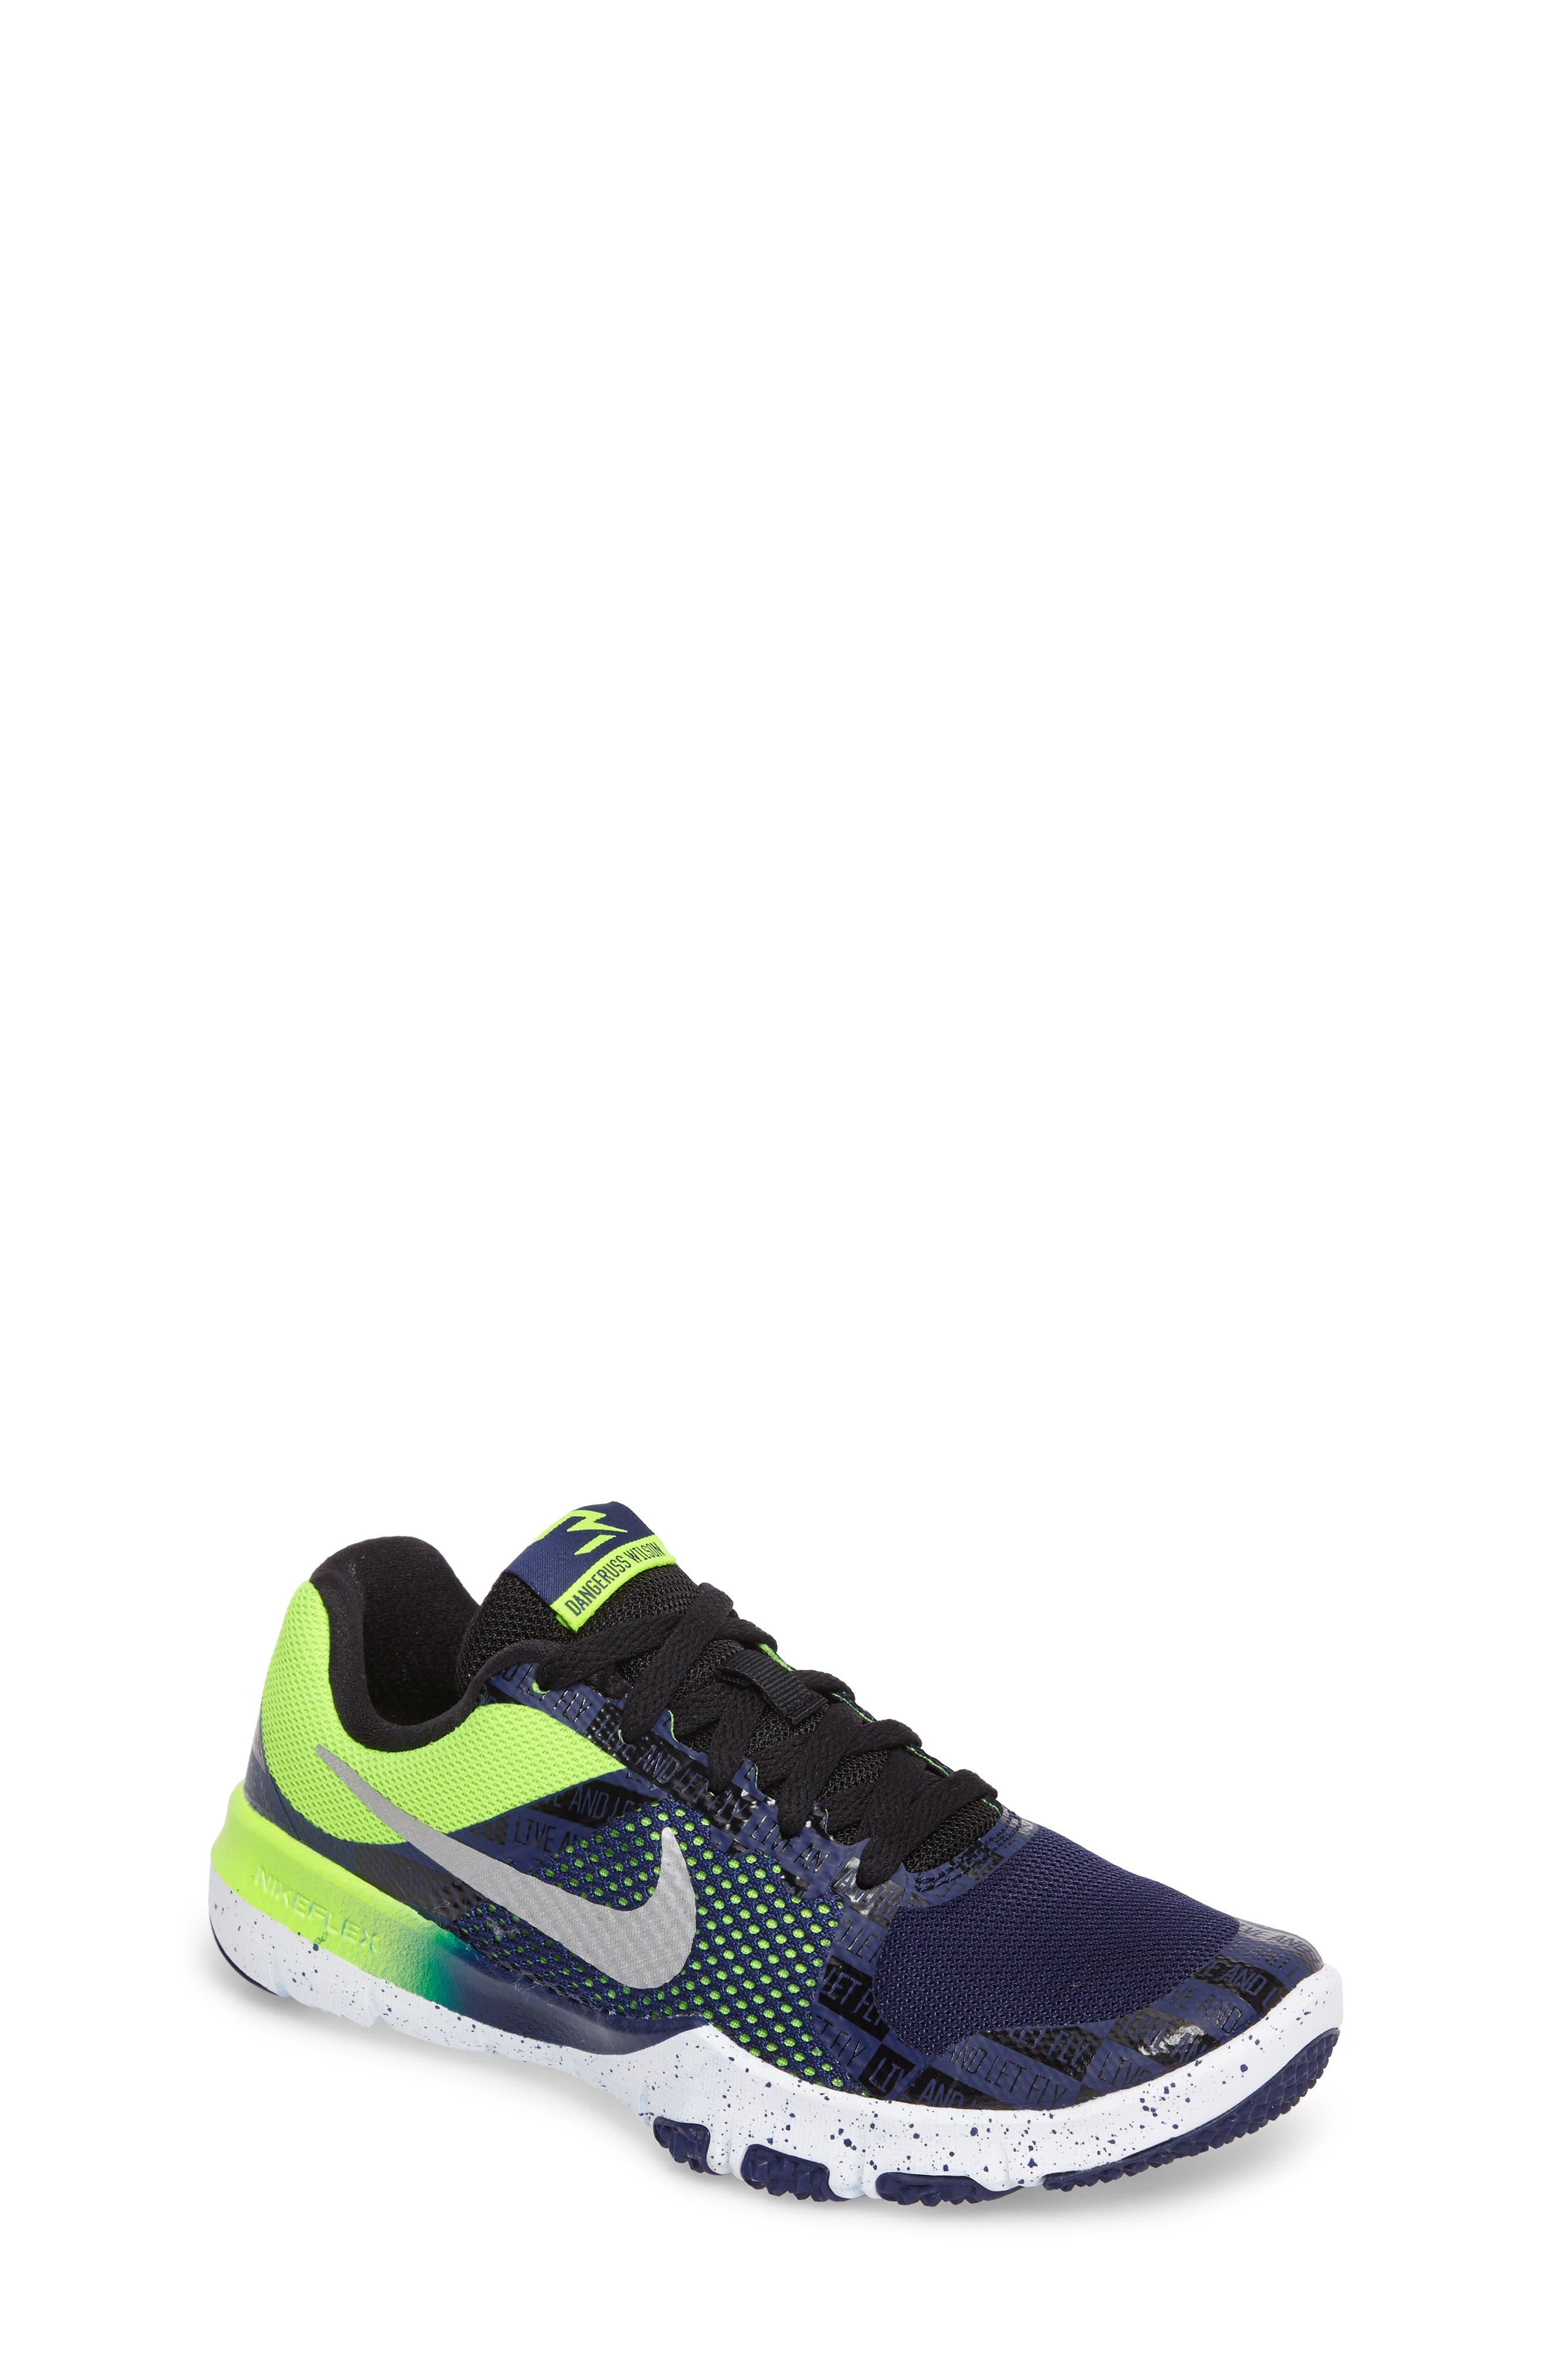 Alternate Image 1 Selected - Nike Flex TR Control Training Shoe (Toddler, Little Kid & Big Kid)